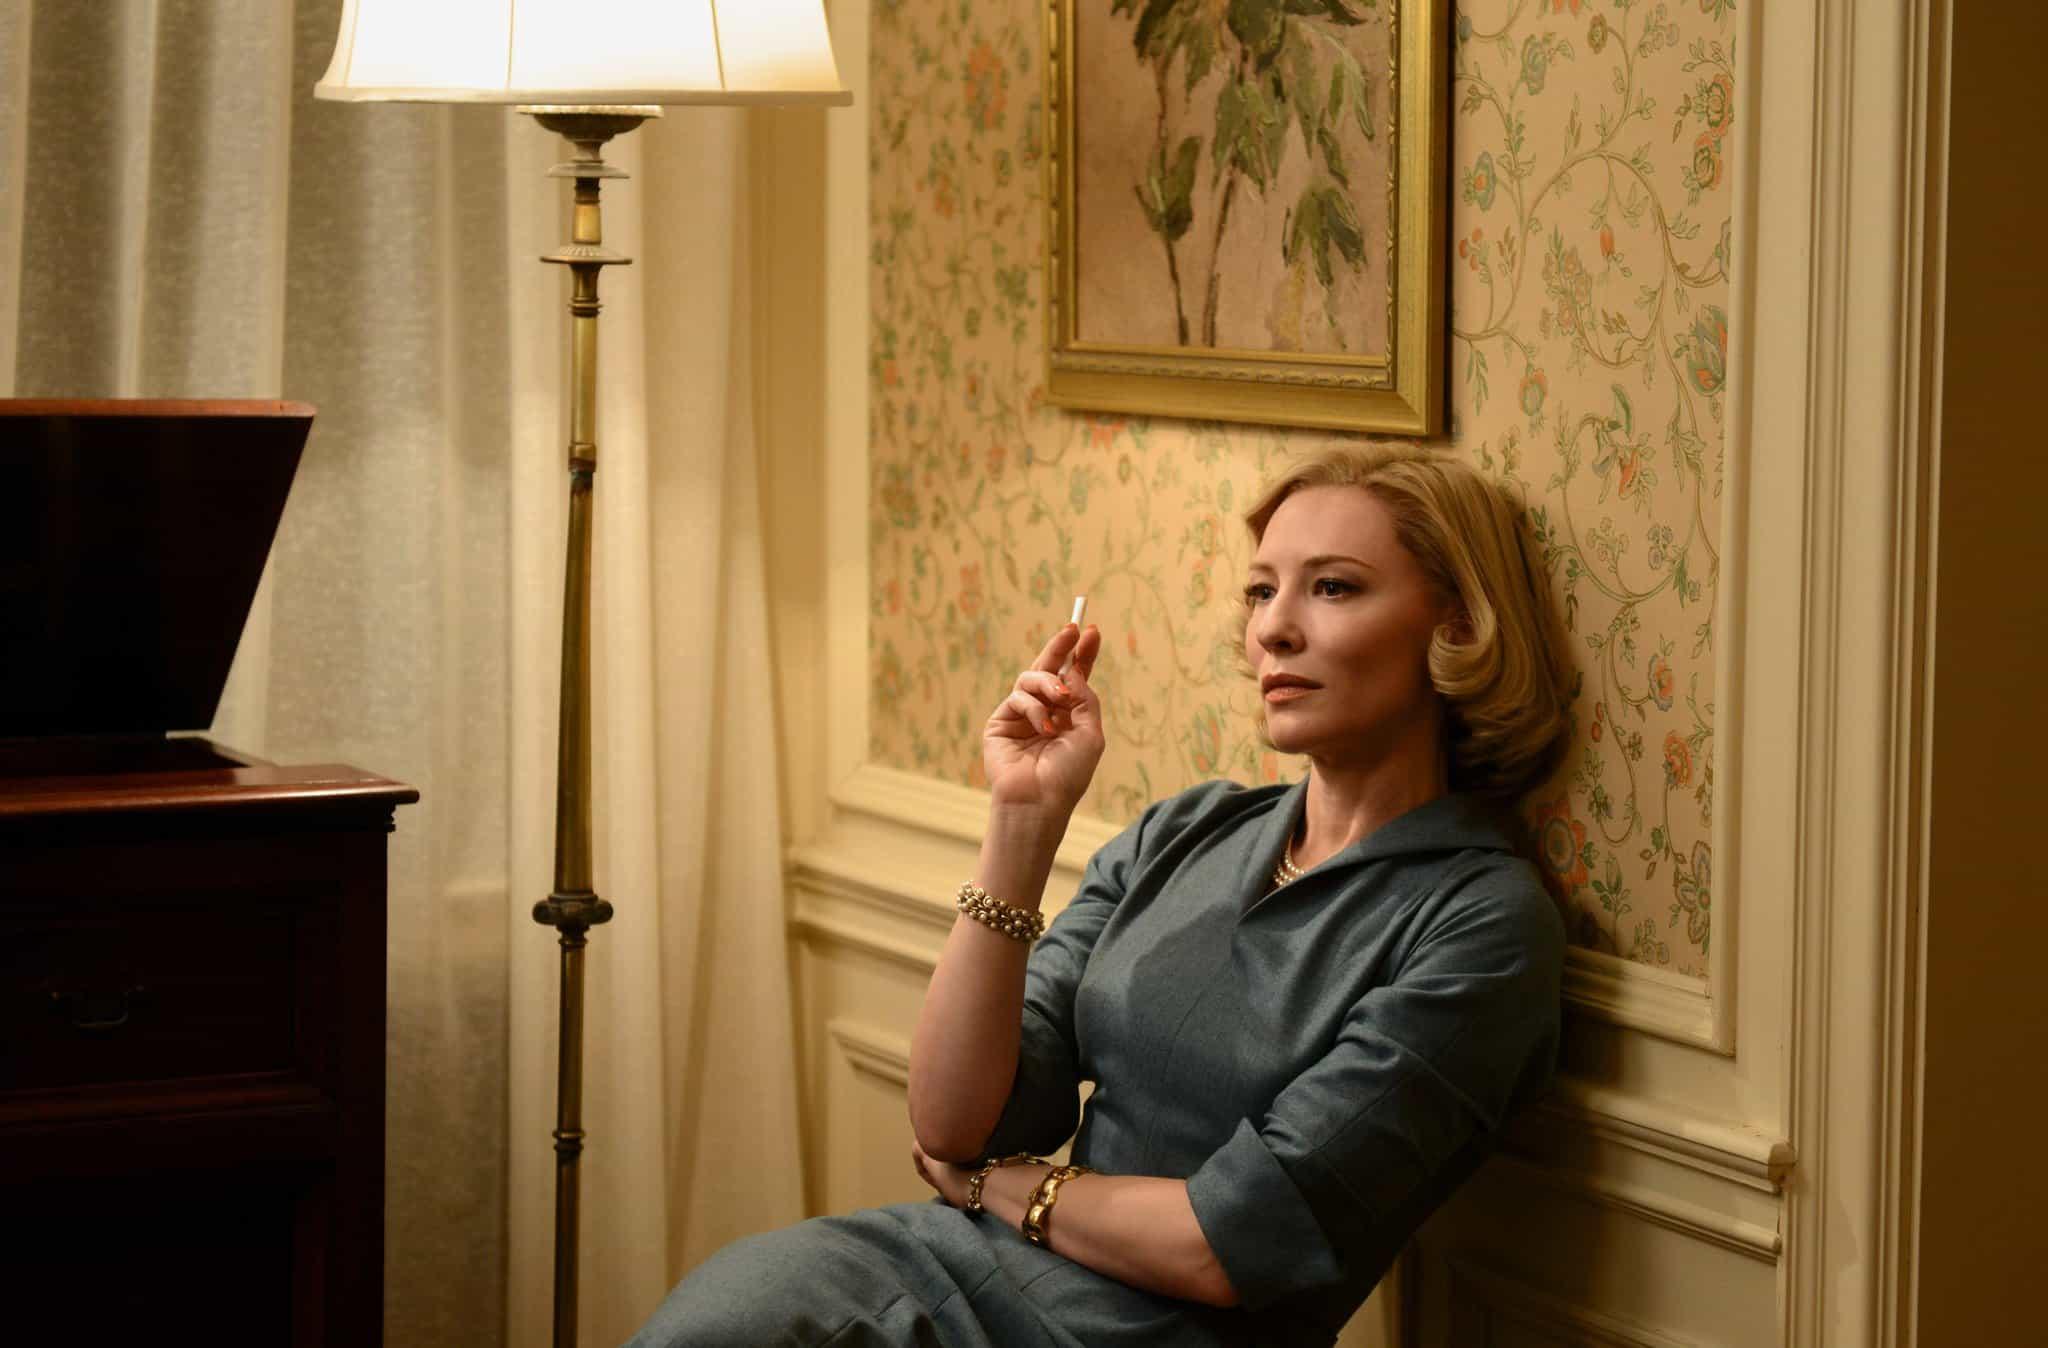 cate blanchett carol - Kristen Stewart estrenará su primer trabajo como directora en Sundance